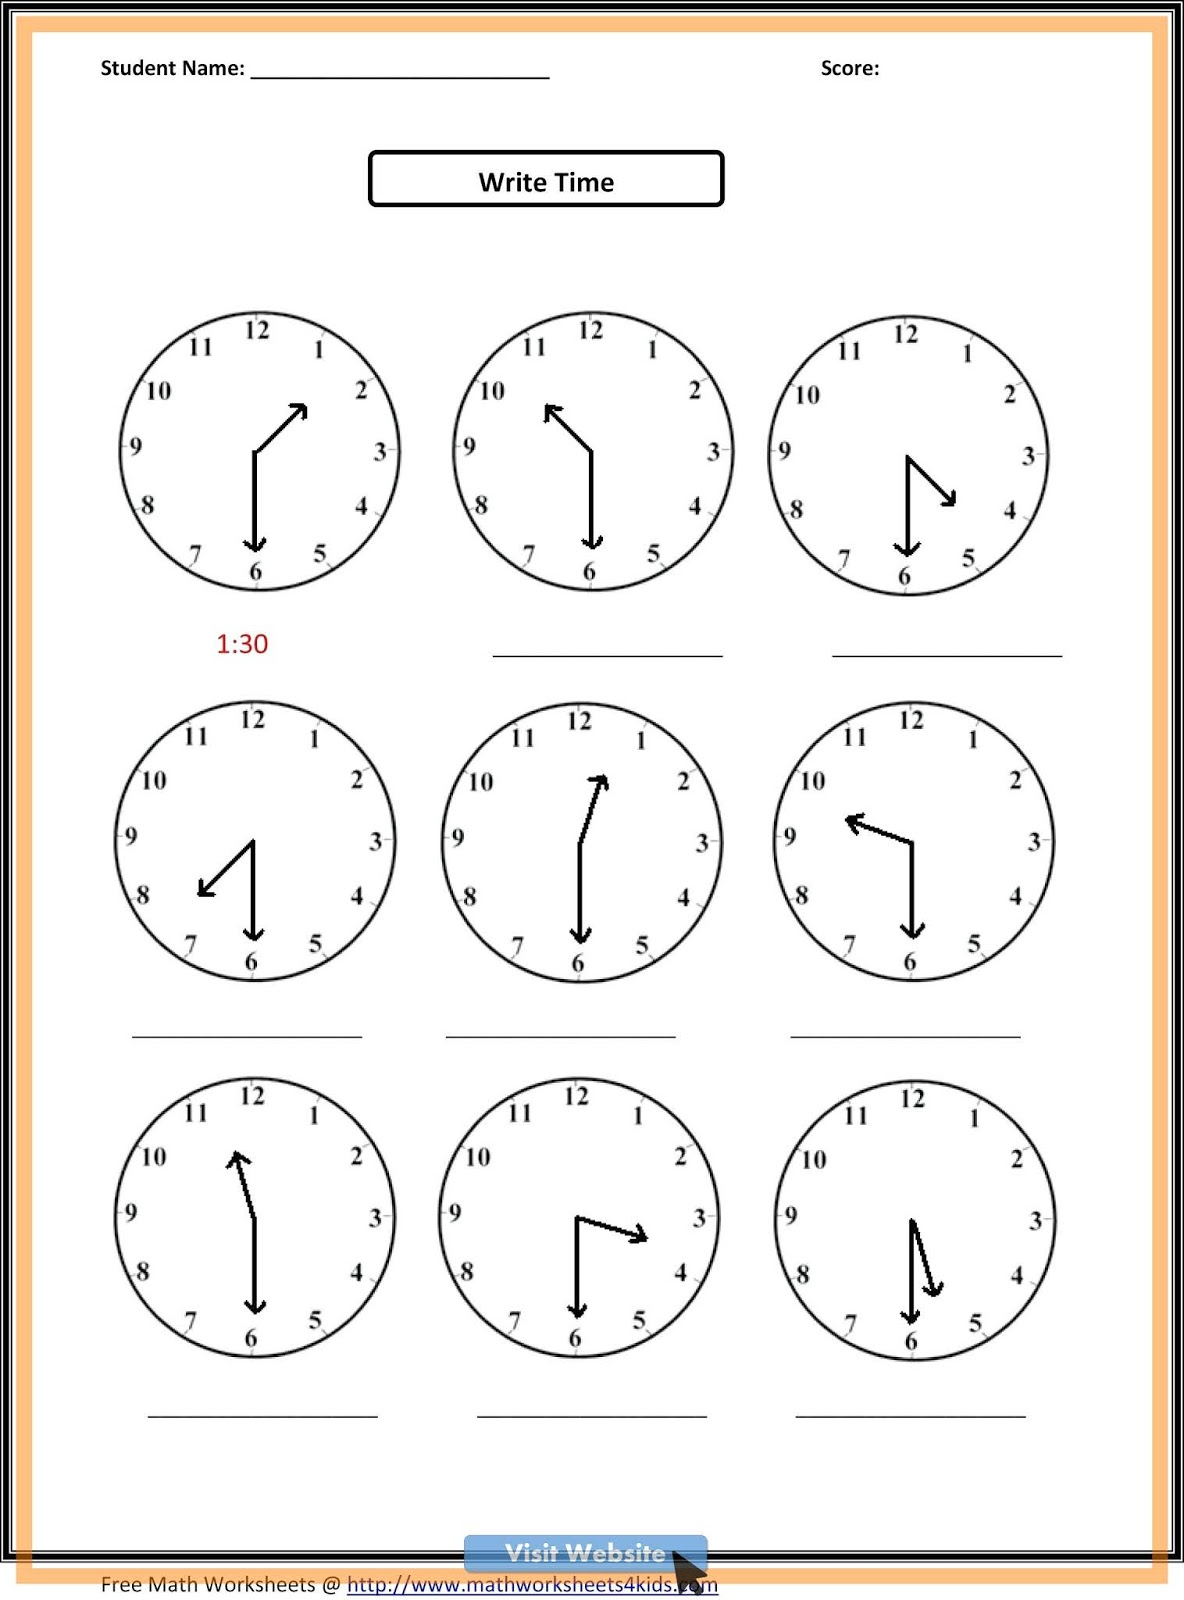 3rd Grade Math Worksheets Word Problems Free Printable